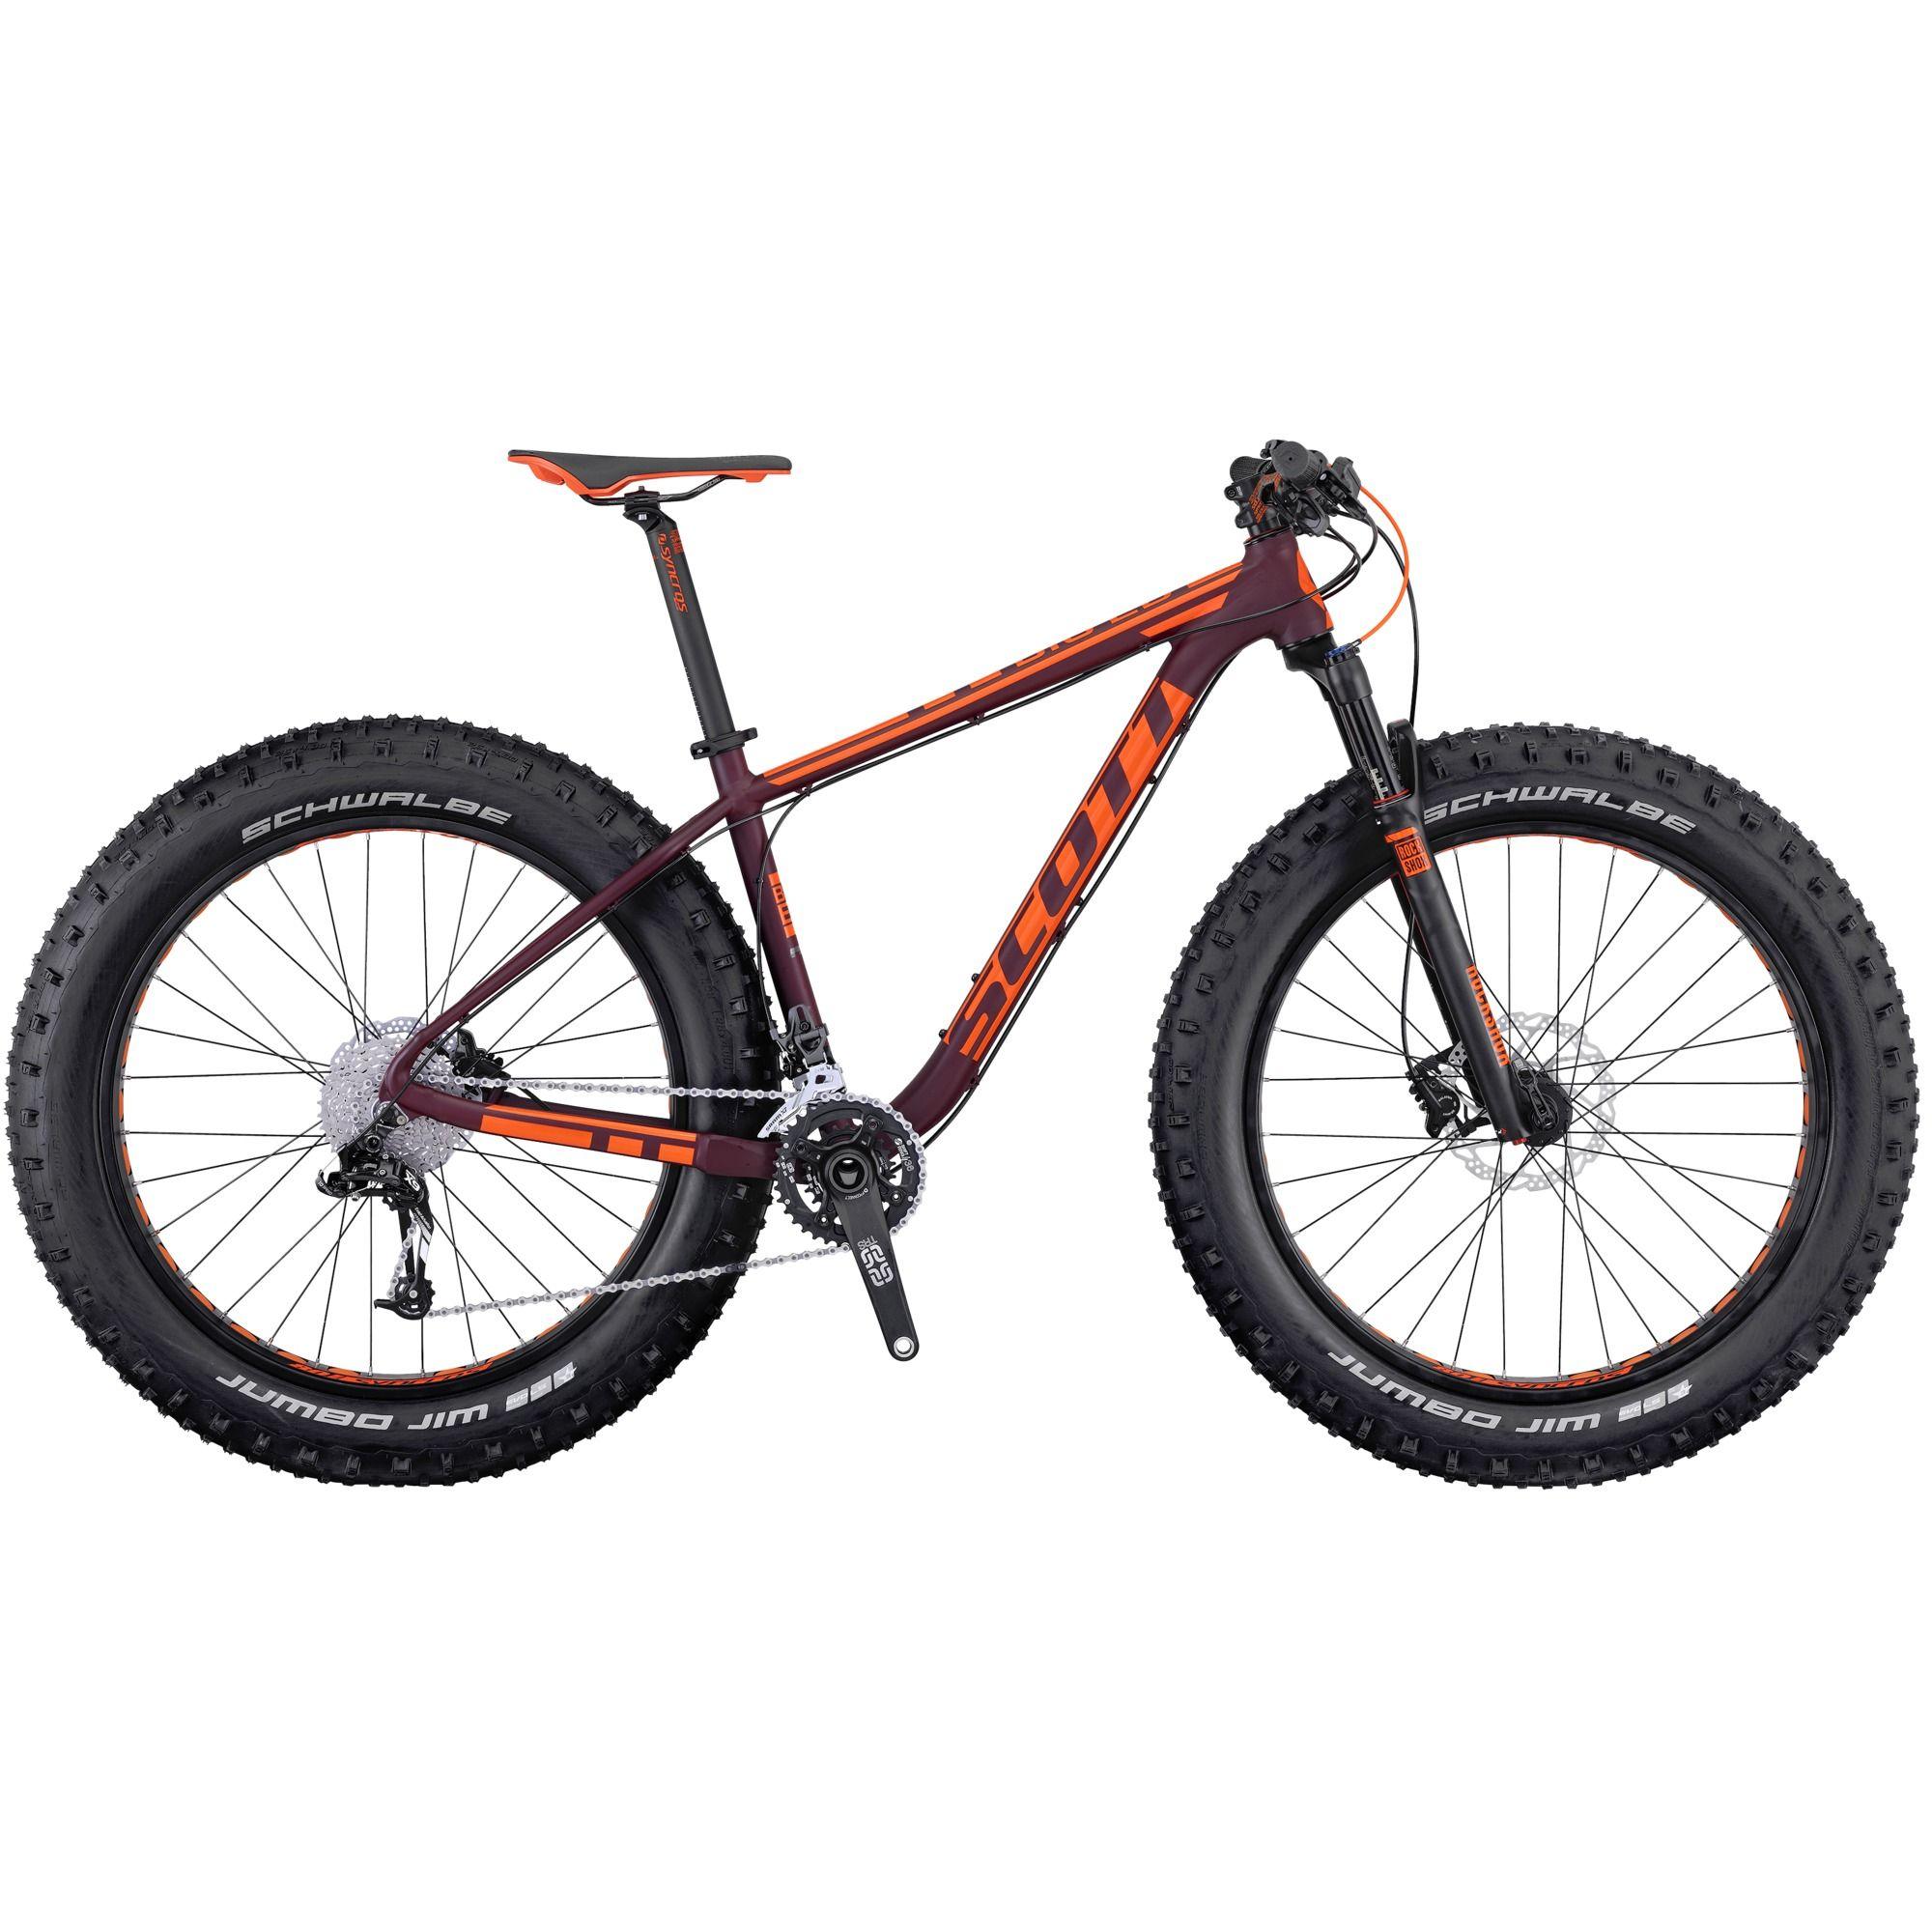 National black bikers roundup 2016 - 2016 Scott Big Ed Hardtail Fat Bike Orange